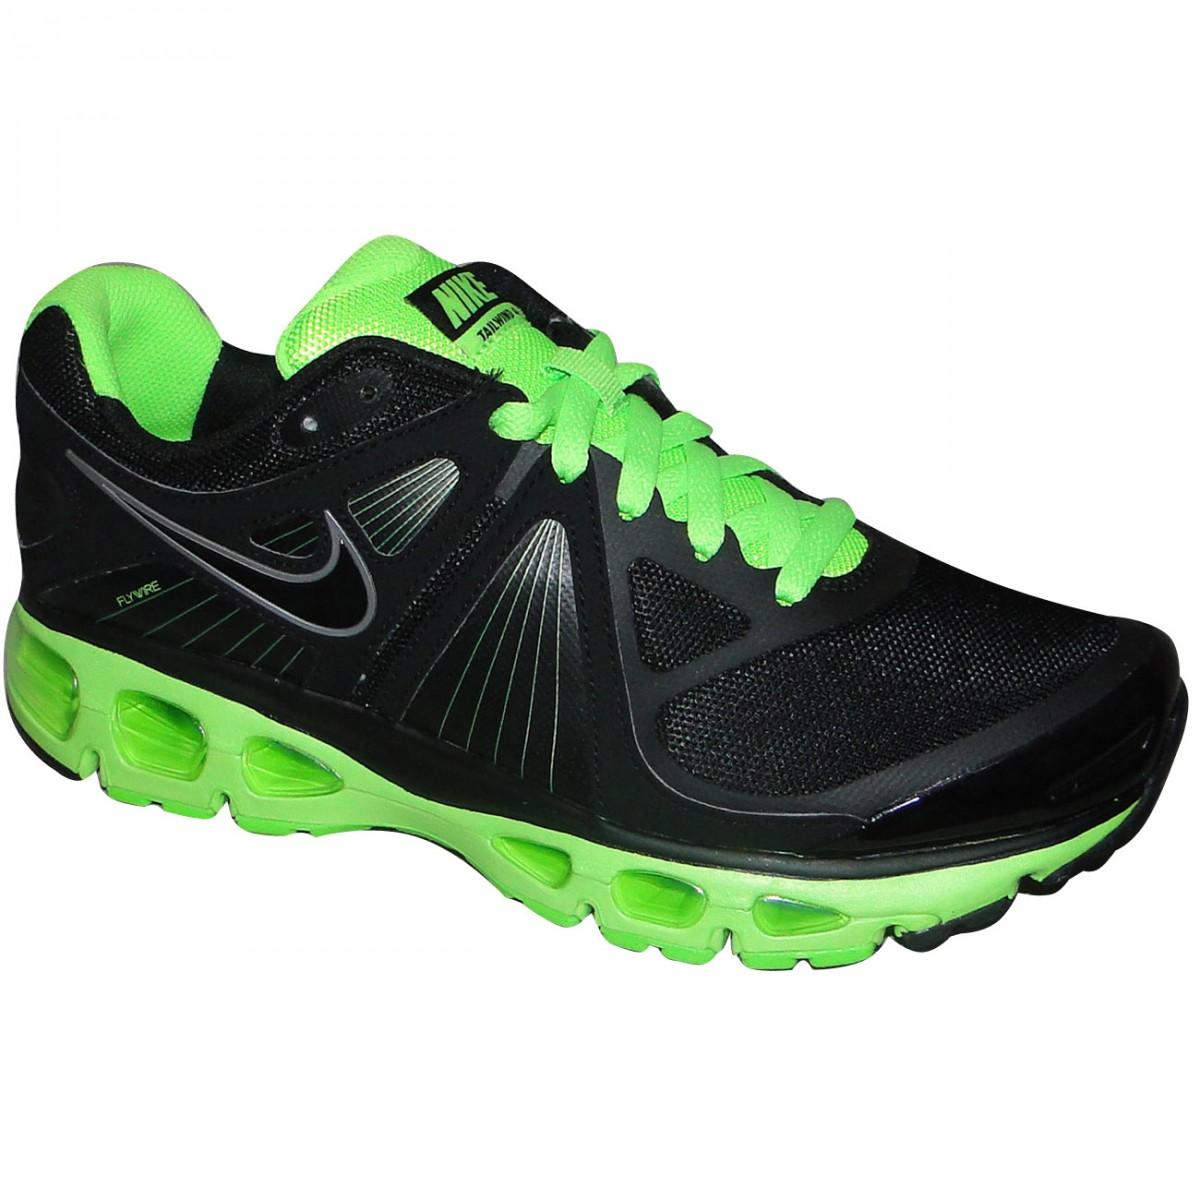 91edd59b4a Tênis Nike Air Max Tailwind+ 4 453976-013 - Preto/Limão - Chuteira Nike,  Adidas. Sandalias Femininas. Sandy Calçados